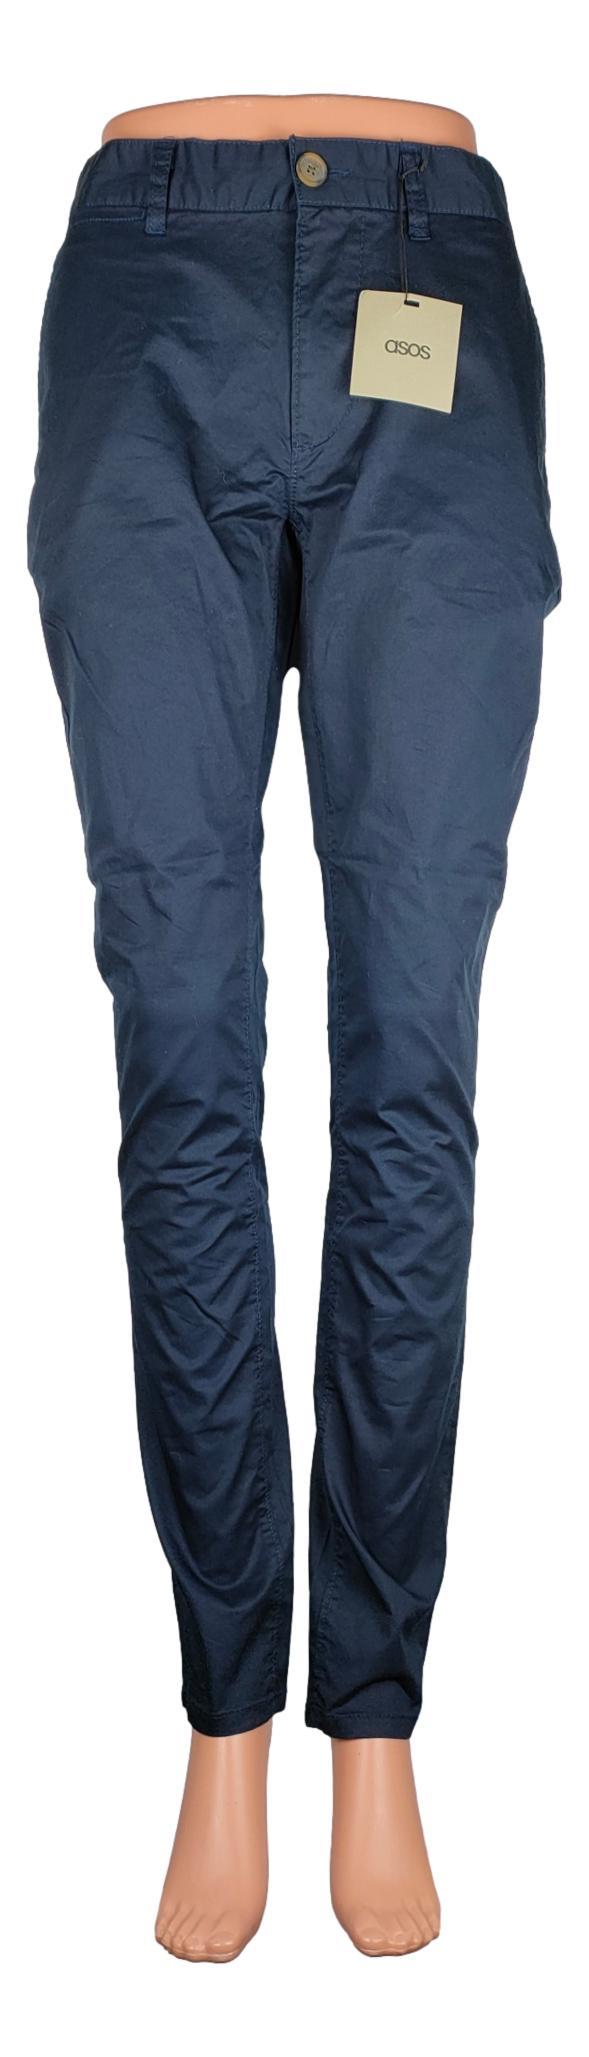 Pantalon Asos - Taille 42